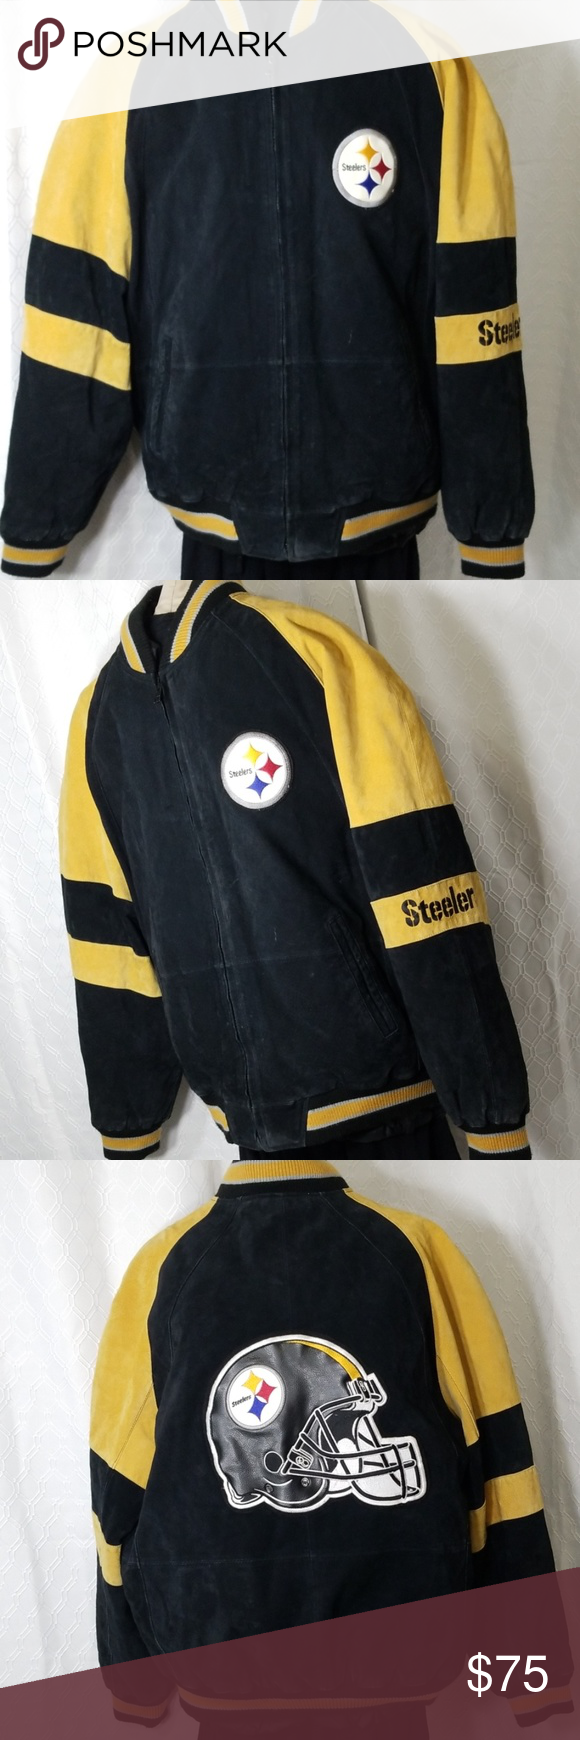 Pittsburgh Steelers jacket Jackets, Steelers jacket